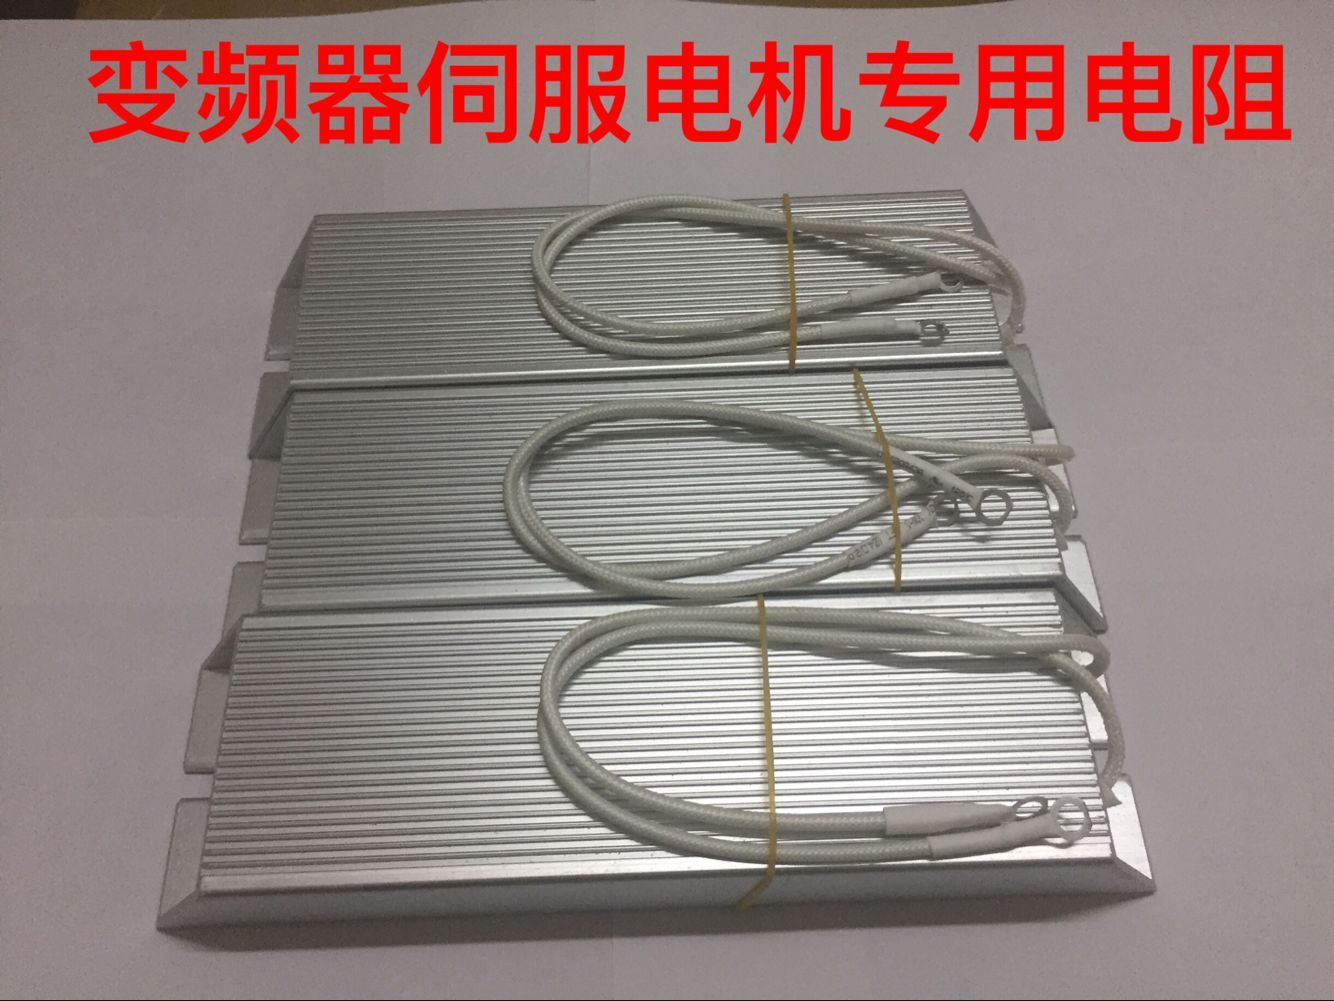 500W65R欧欧姆放电电阻器变频器伺服电机梯形铝壳刹车制动500W50R